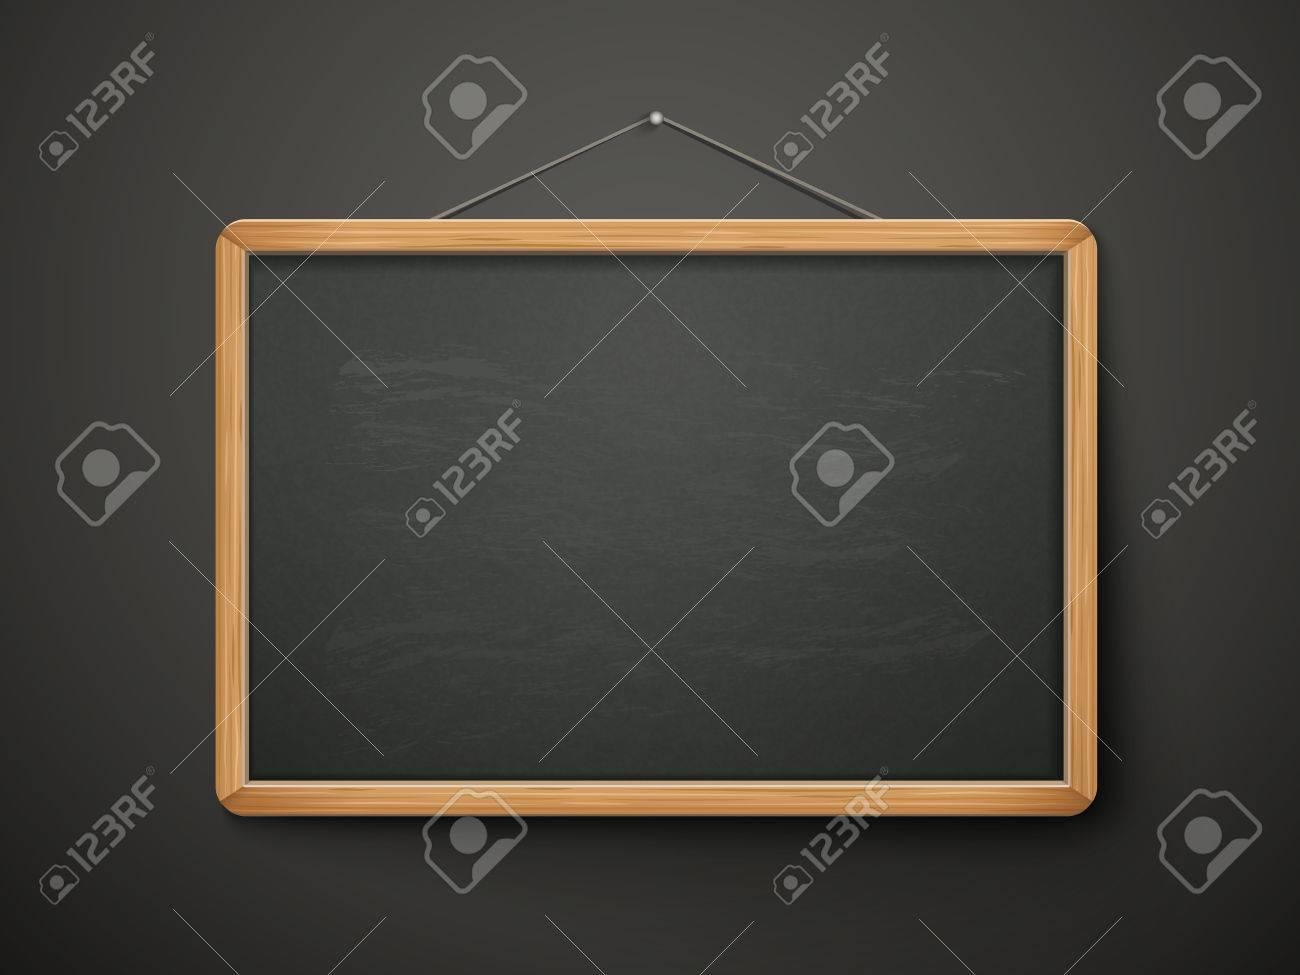 Blank Blackboard In Wooden Frame Isolated Over Black Background ...